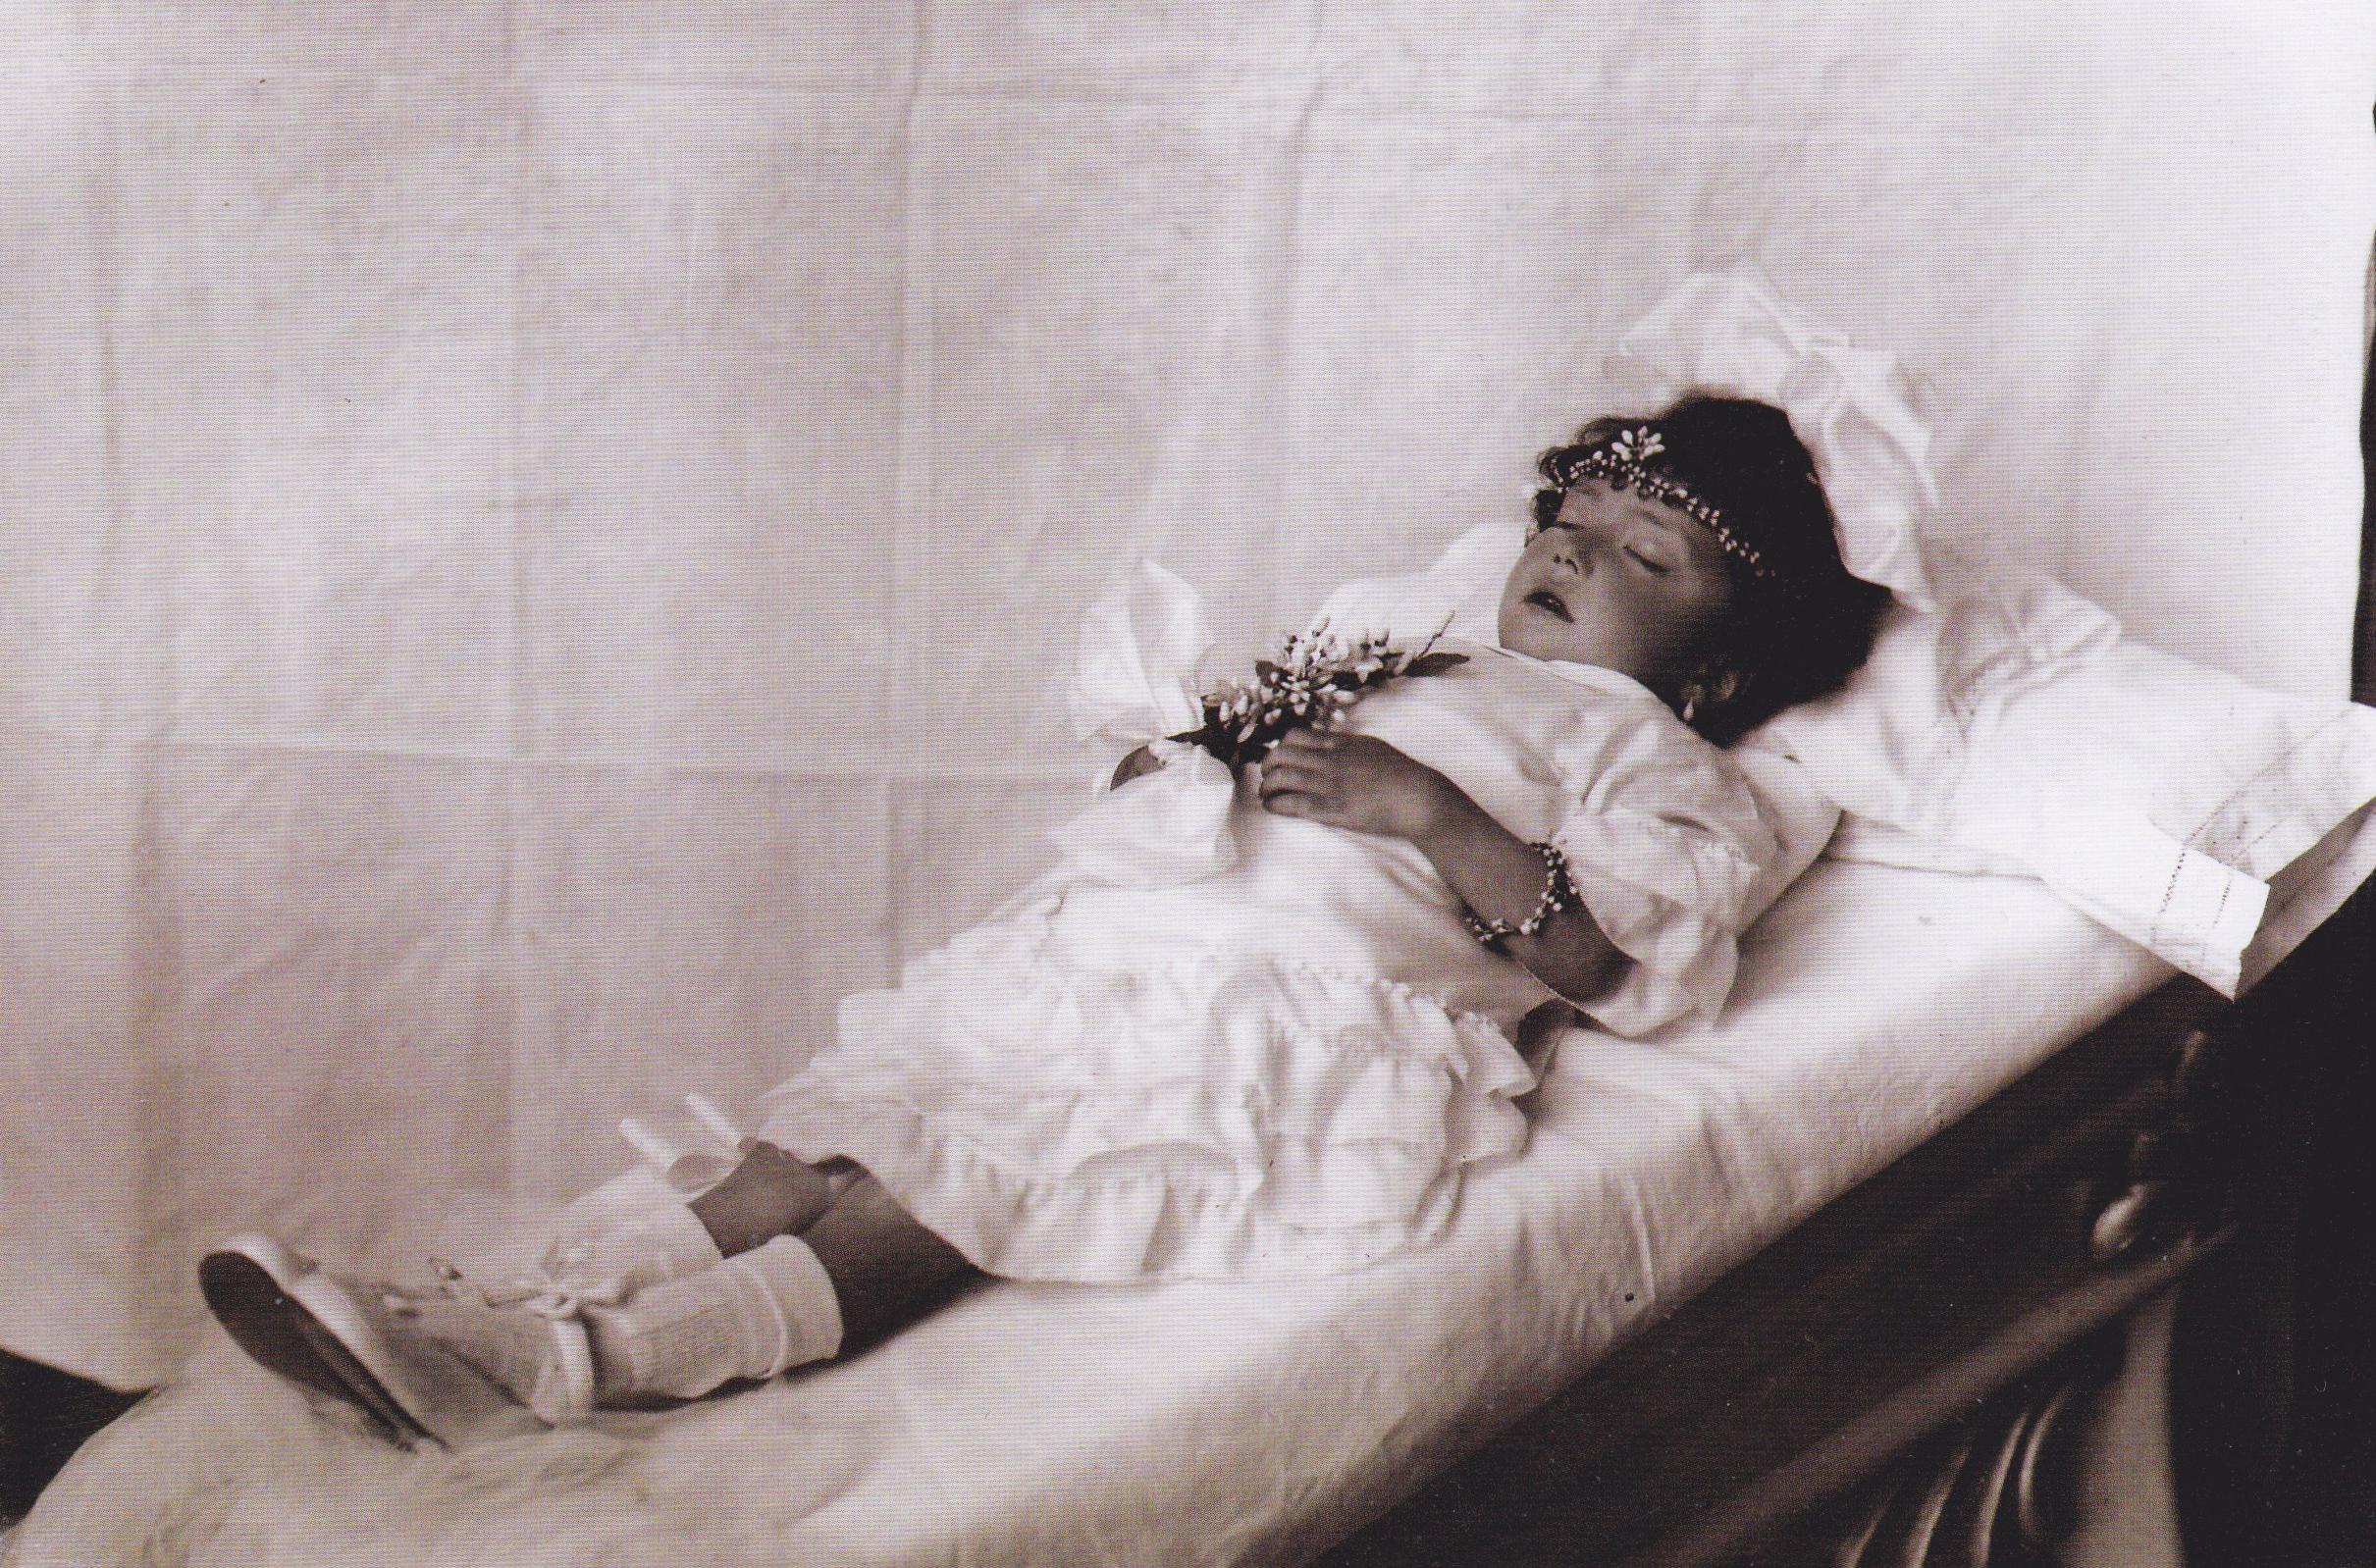 Una tradición a punto de morir: fotografiar a muertos en Bolivia ...